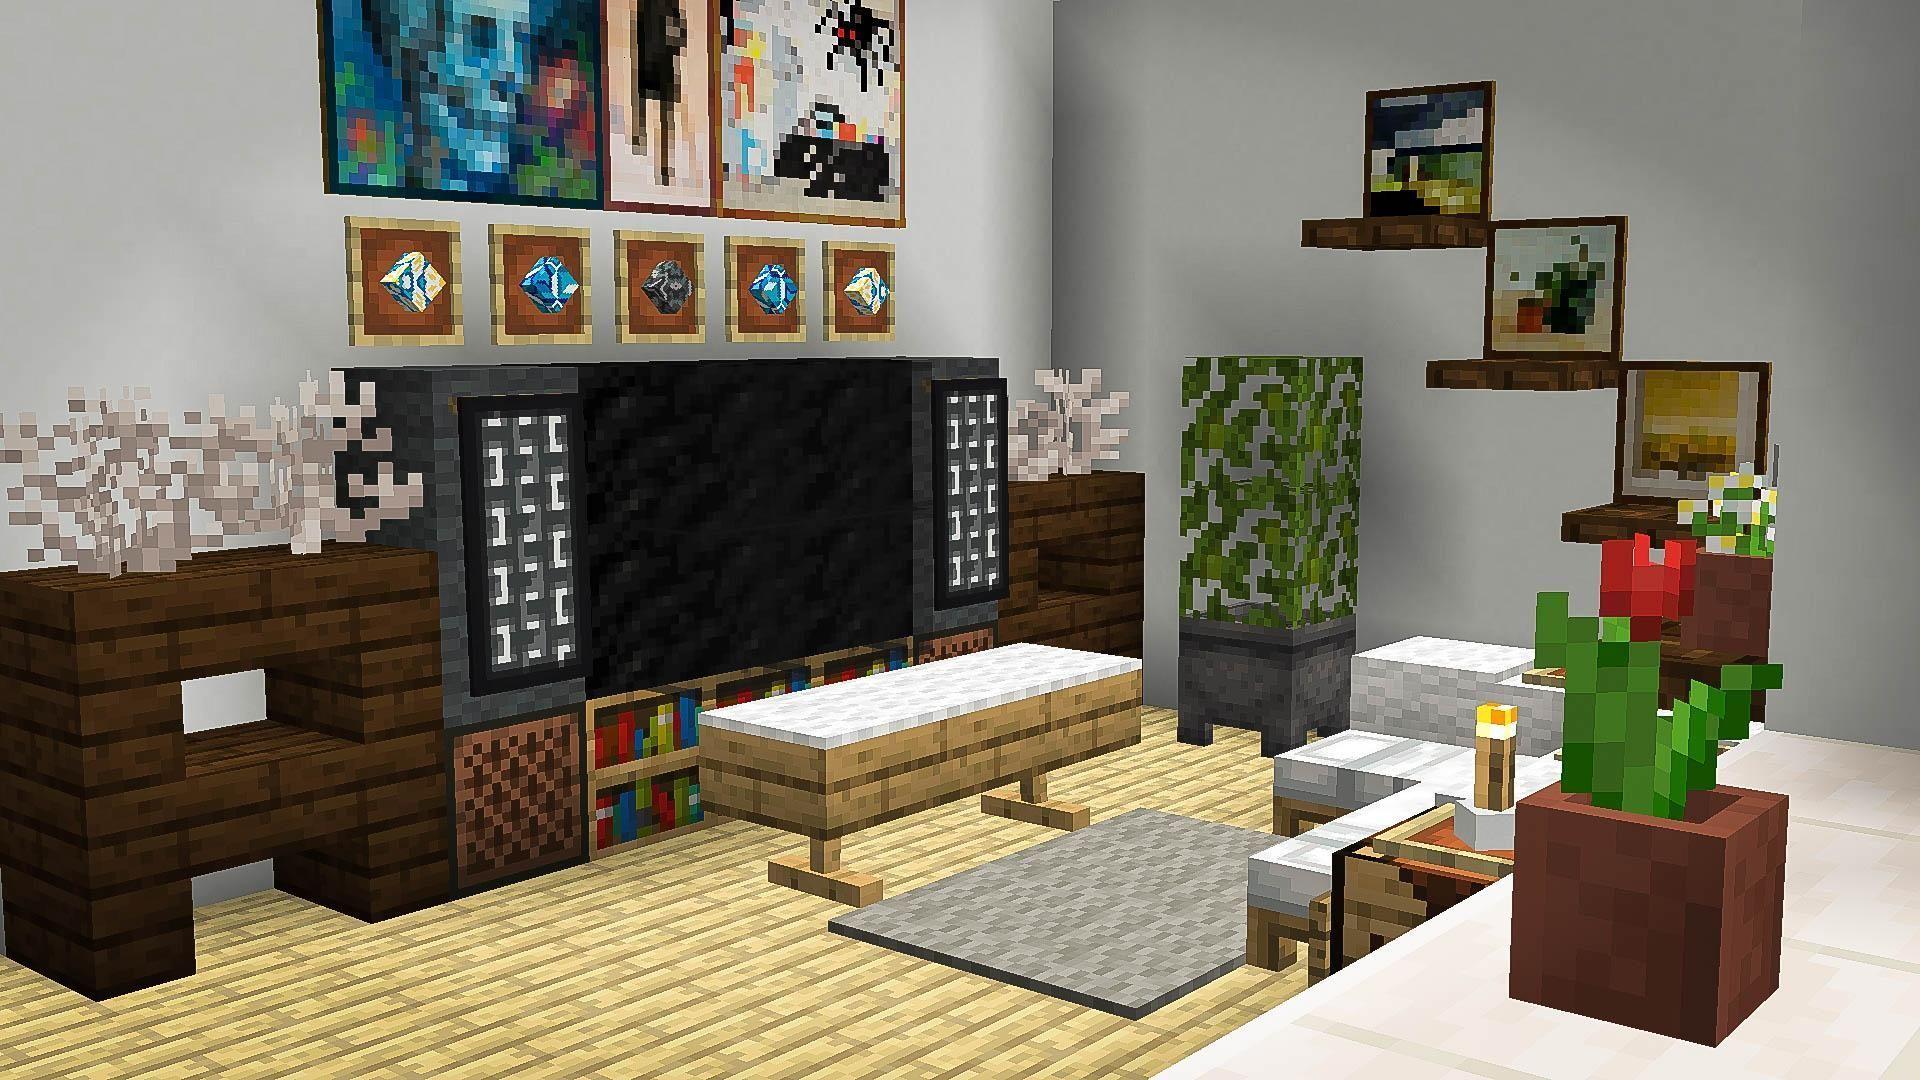 A Bright Living Room Minecraft Giftinggamesonline En 2020 Maison Minecraft Meubles Minecraft Deco Minecraft